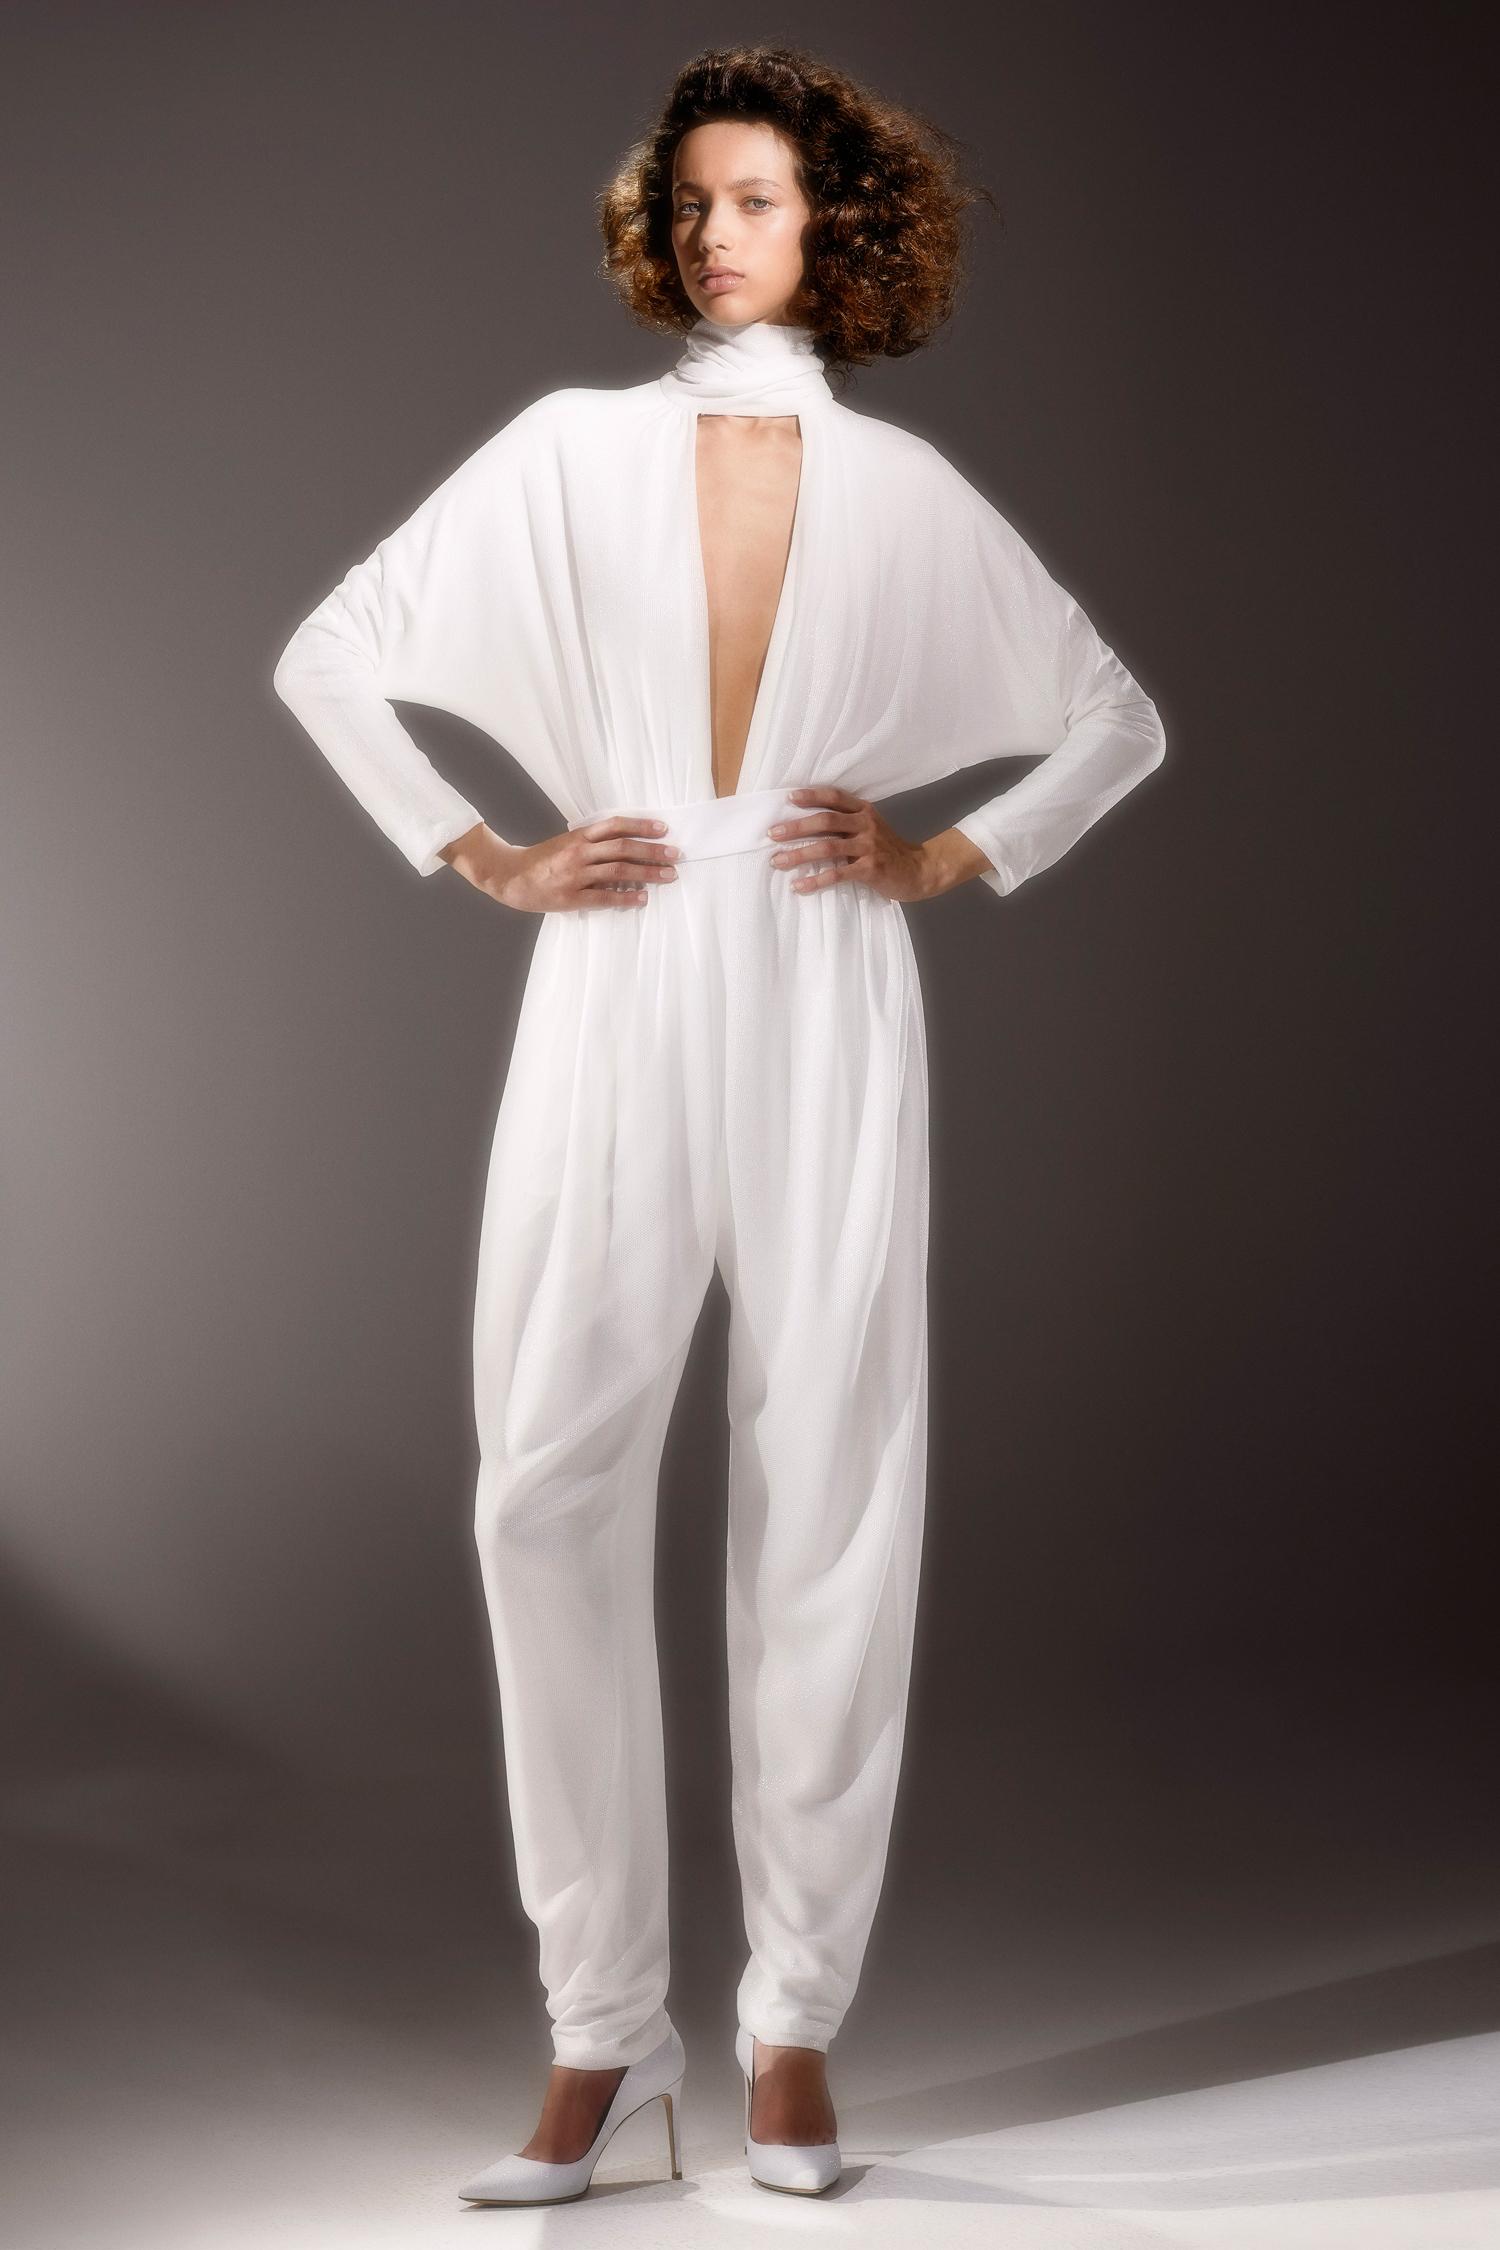 viktor and rolf long sleeve plunging neckline jumpsuit wedding dress spring 2020